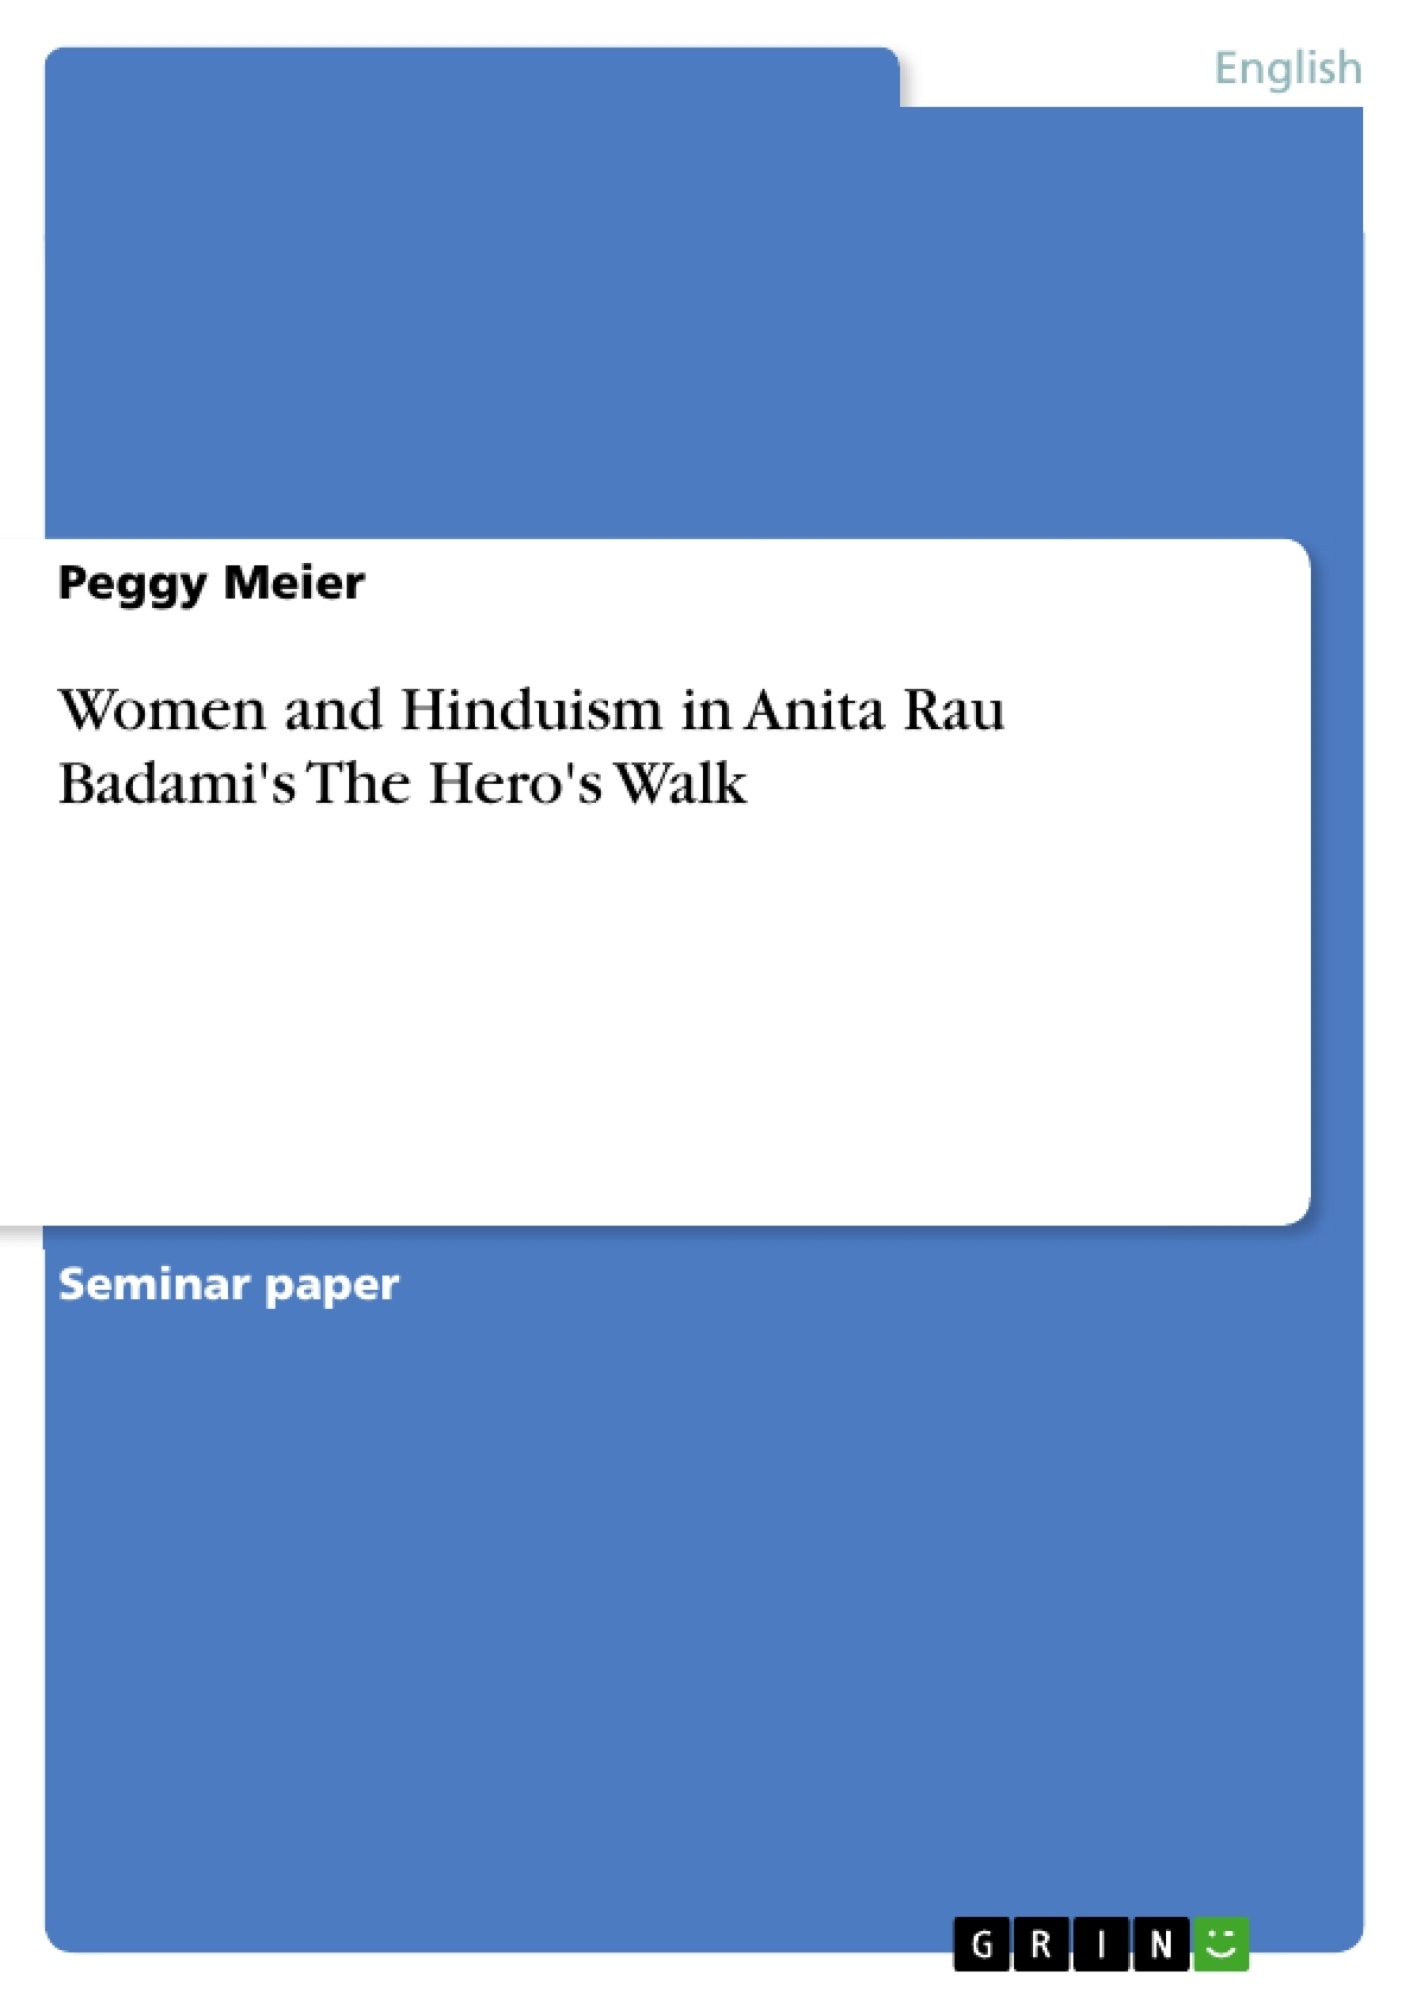 Title: Women and Hinduism in Anita Rau Badami's The Hero's Walk